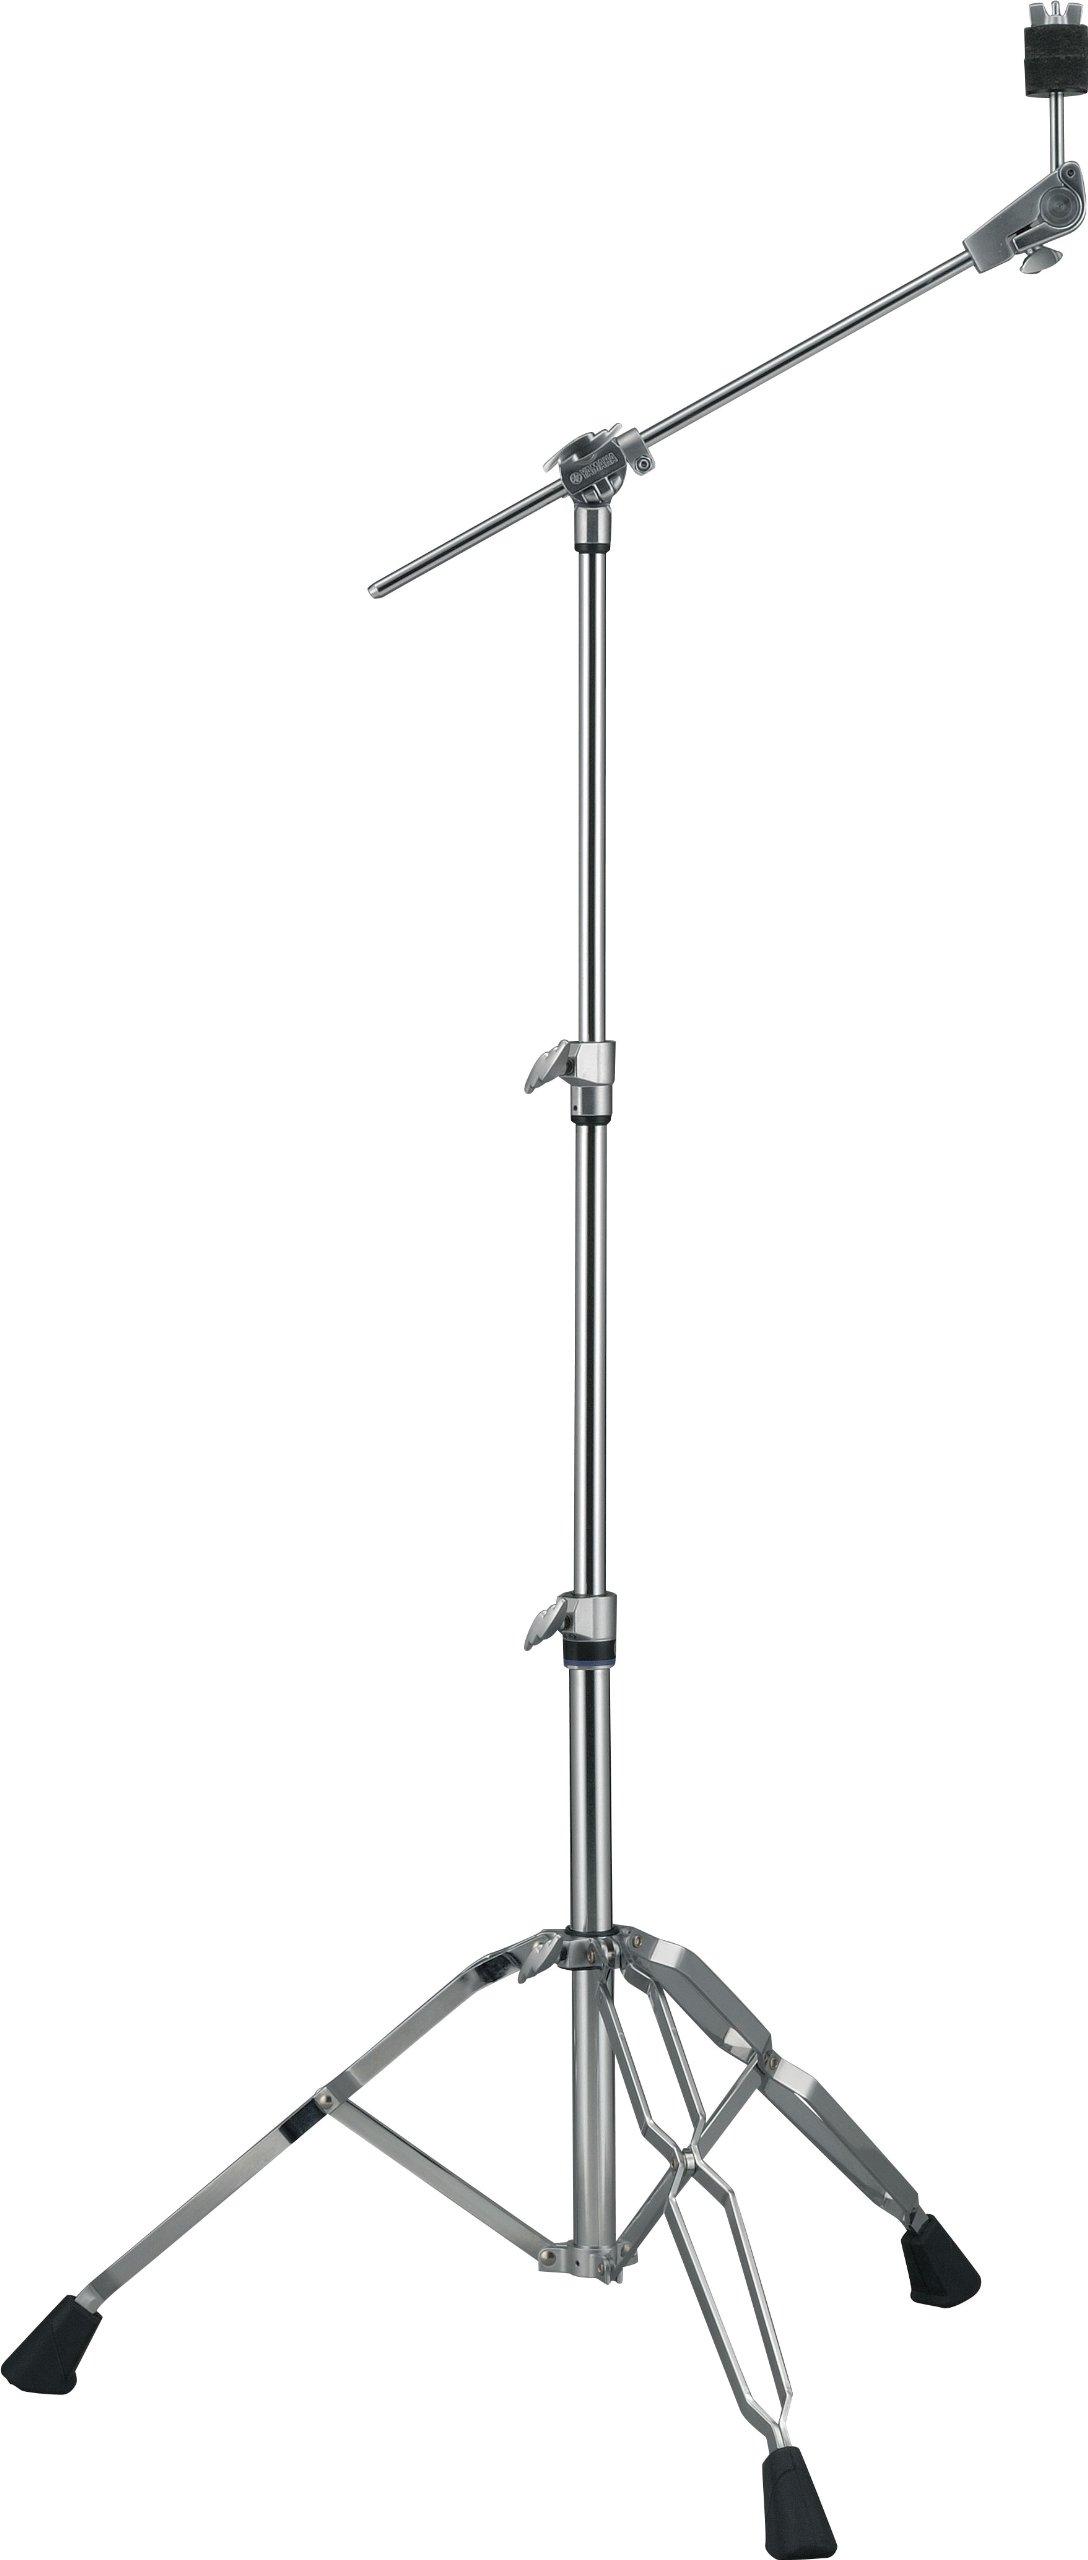 Yamaha CS-865 Boom Cymbal Stand - Heavy Weight, Double Braced